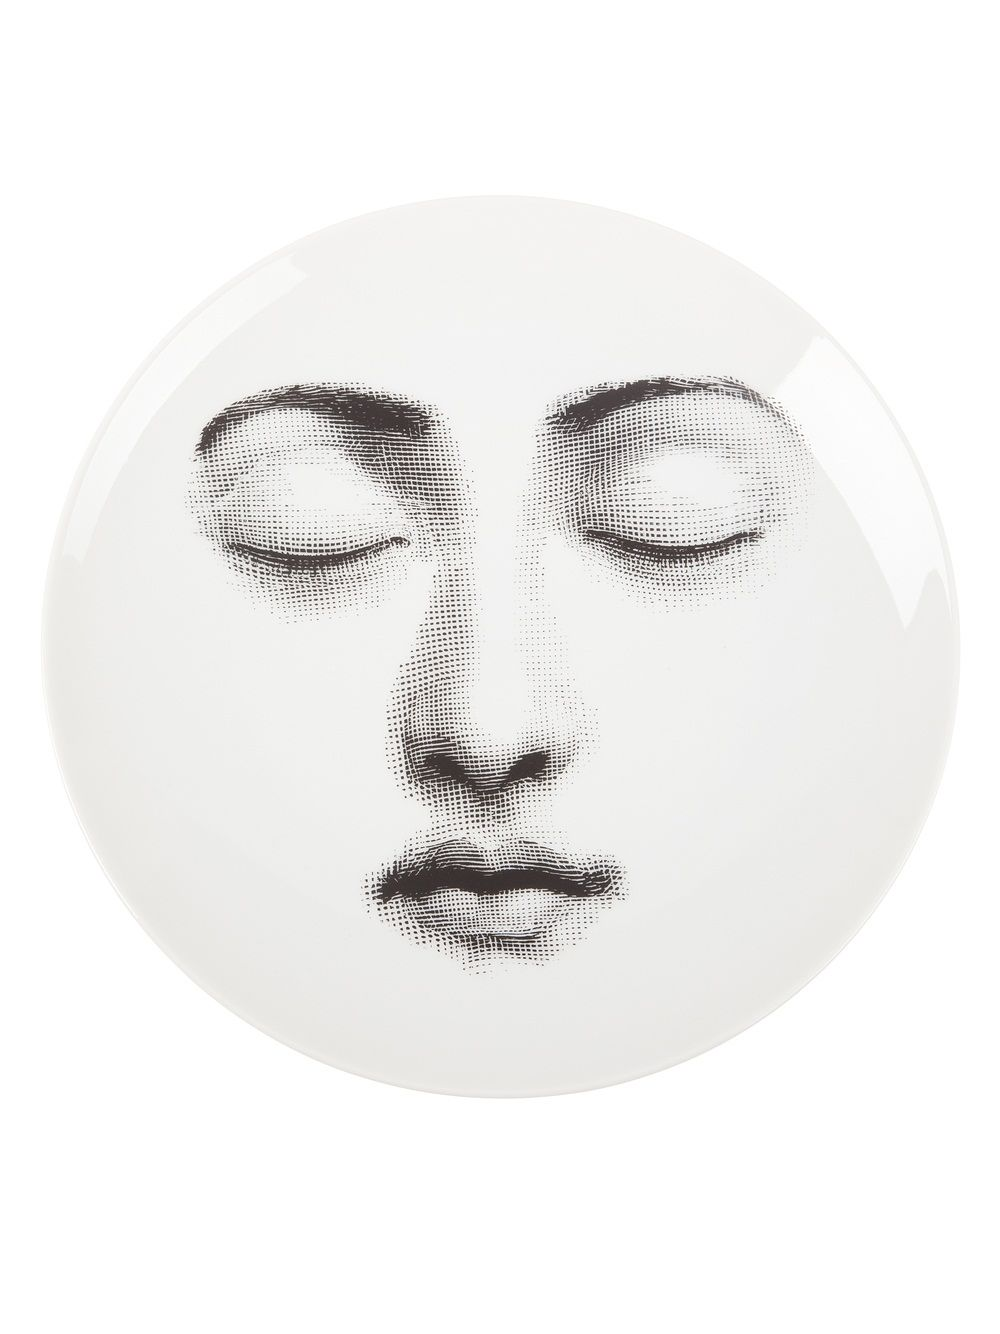 Art faces  sc 1 st  Pinterest & Fornasetti Plate | Piero fornasetti Face and Illustrators